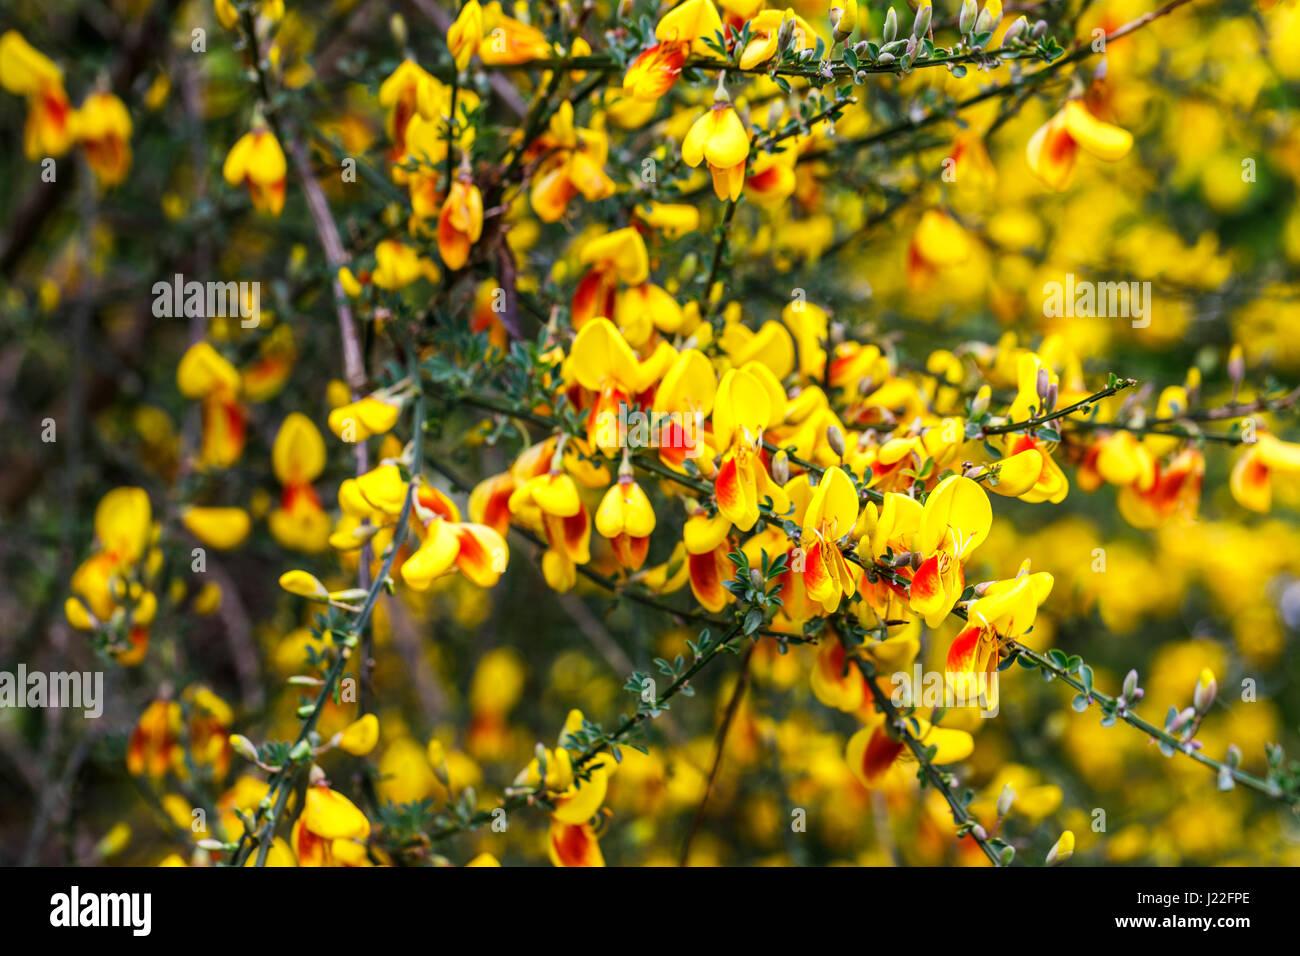 Yellow And Orange Spring Flowering Broom Bush Blooming As An Stock